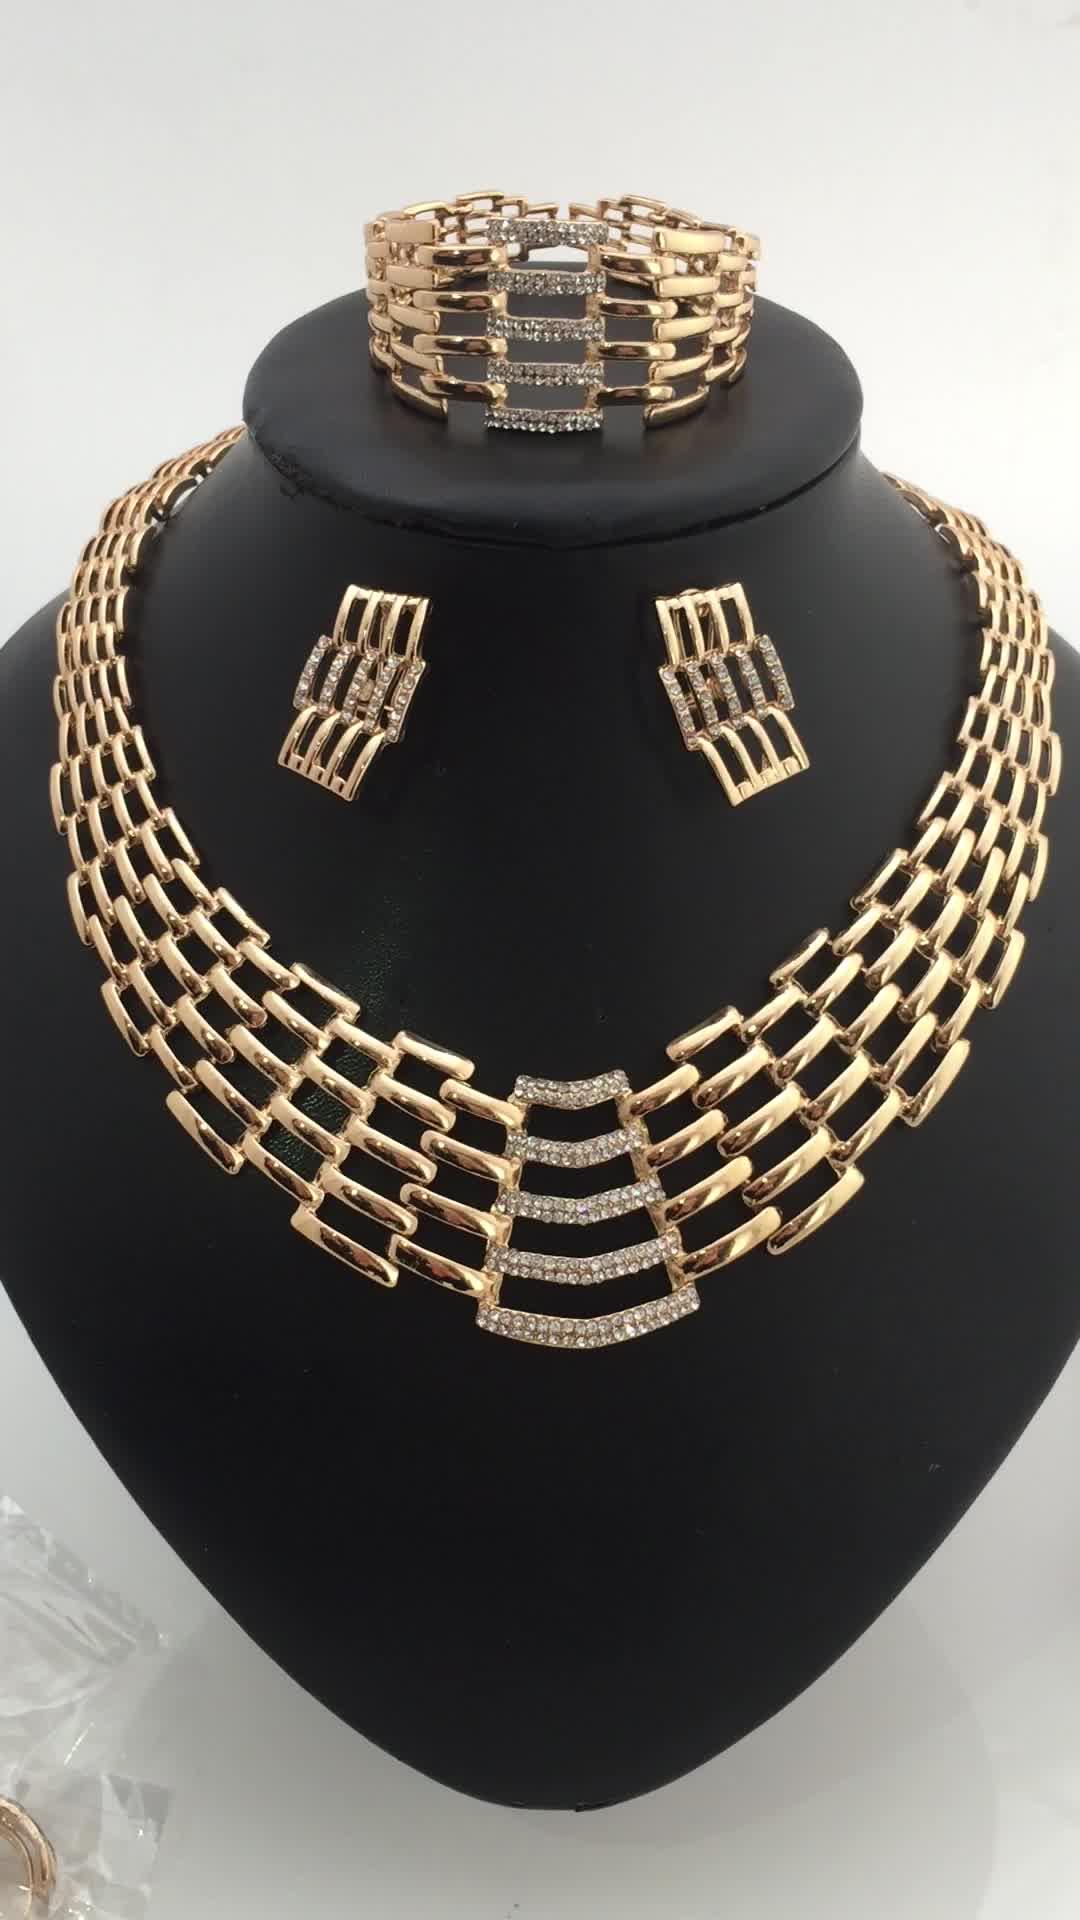 Wholesale African Negerian Women 18k Bridal Wedding Dubai Gold Plated Jewelry Set Girl Necklace